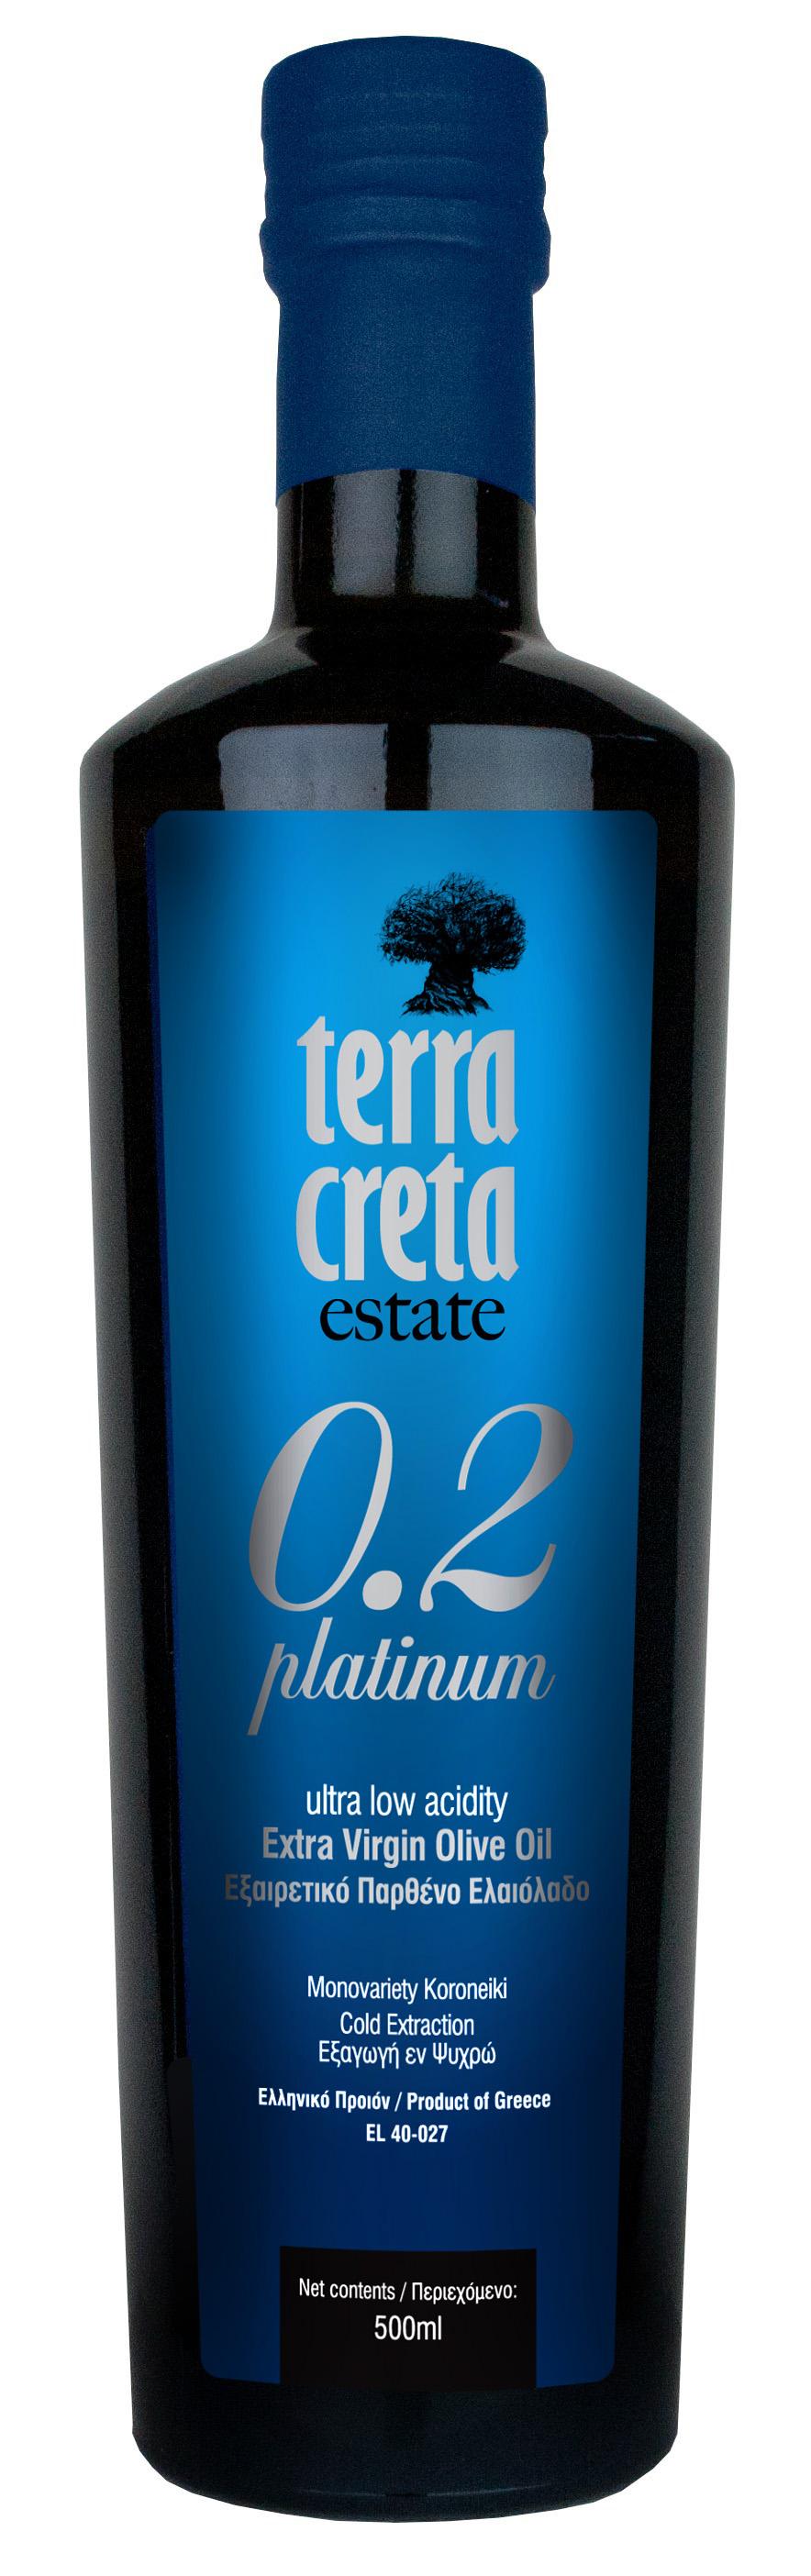 Terra Creta Extra-neitsytoliiviöljy, PLATINUM, 500ml